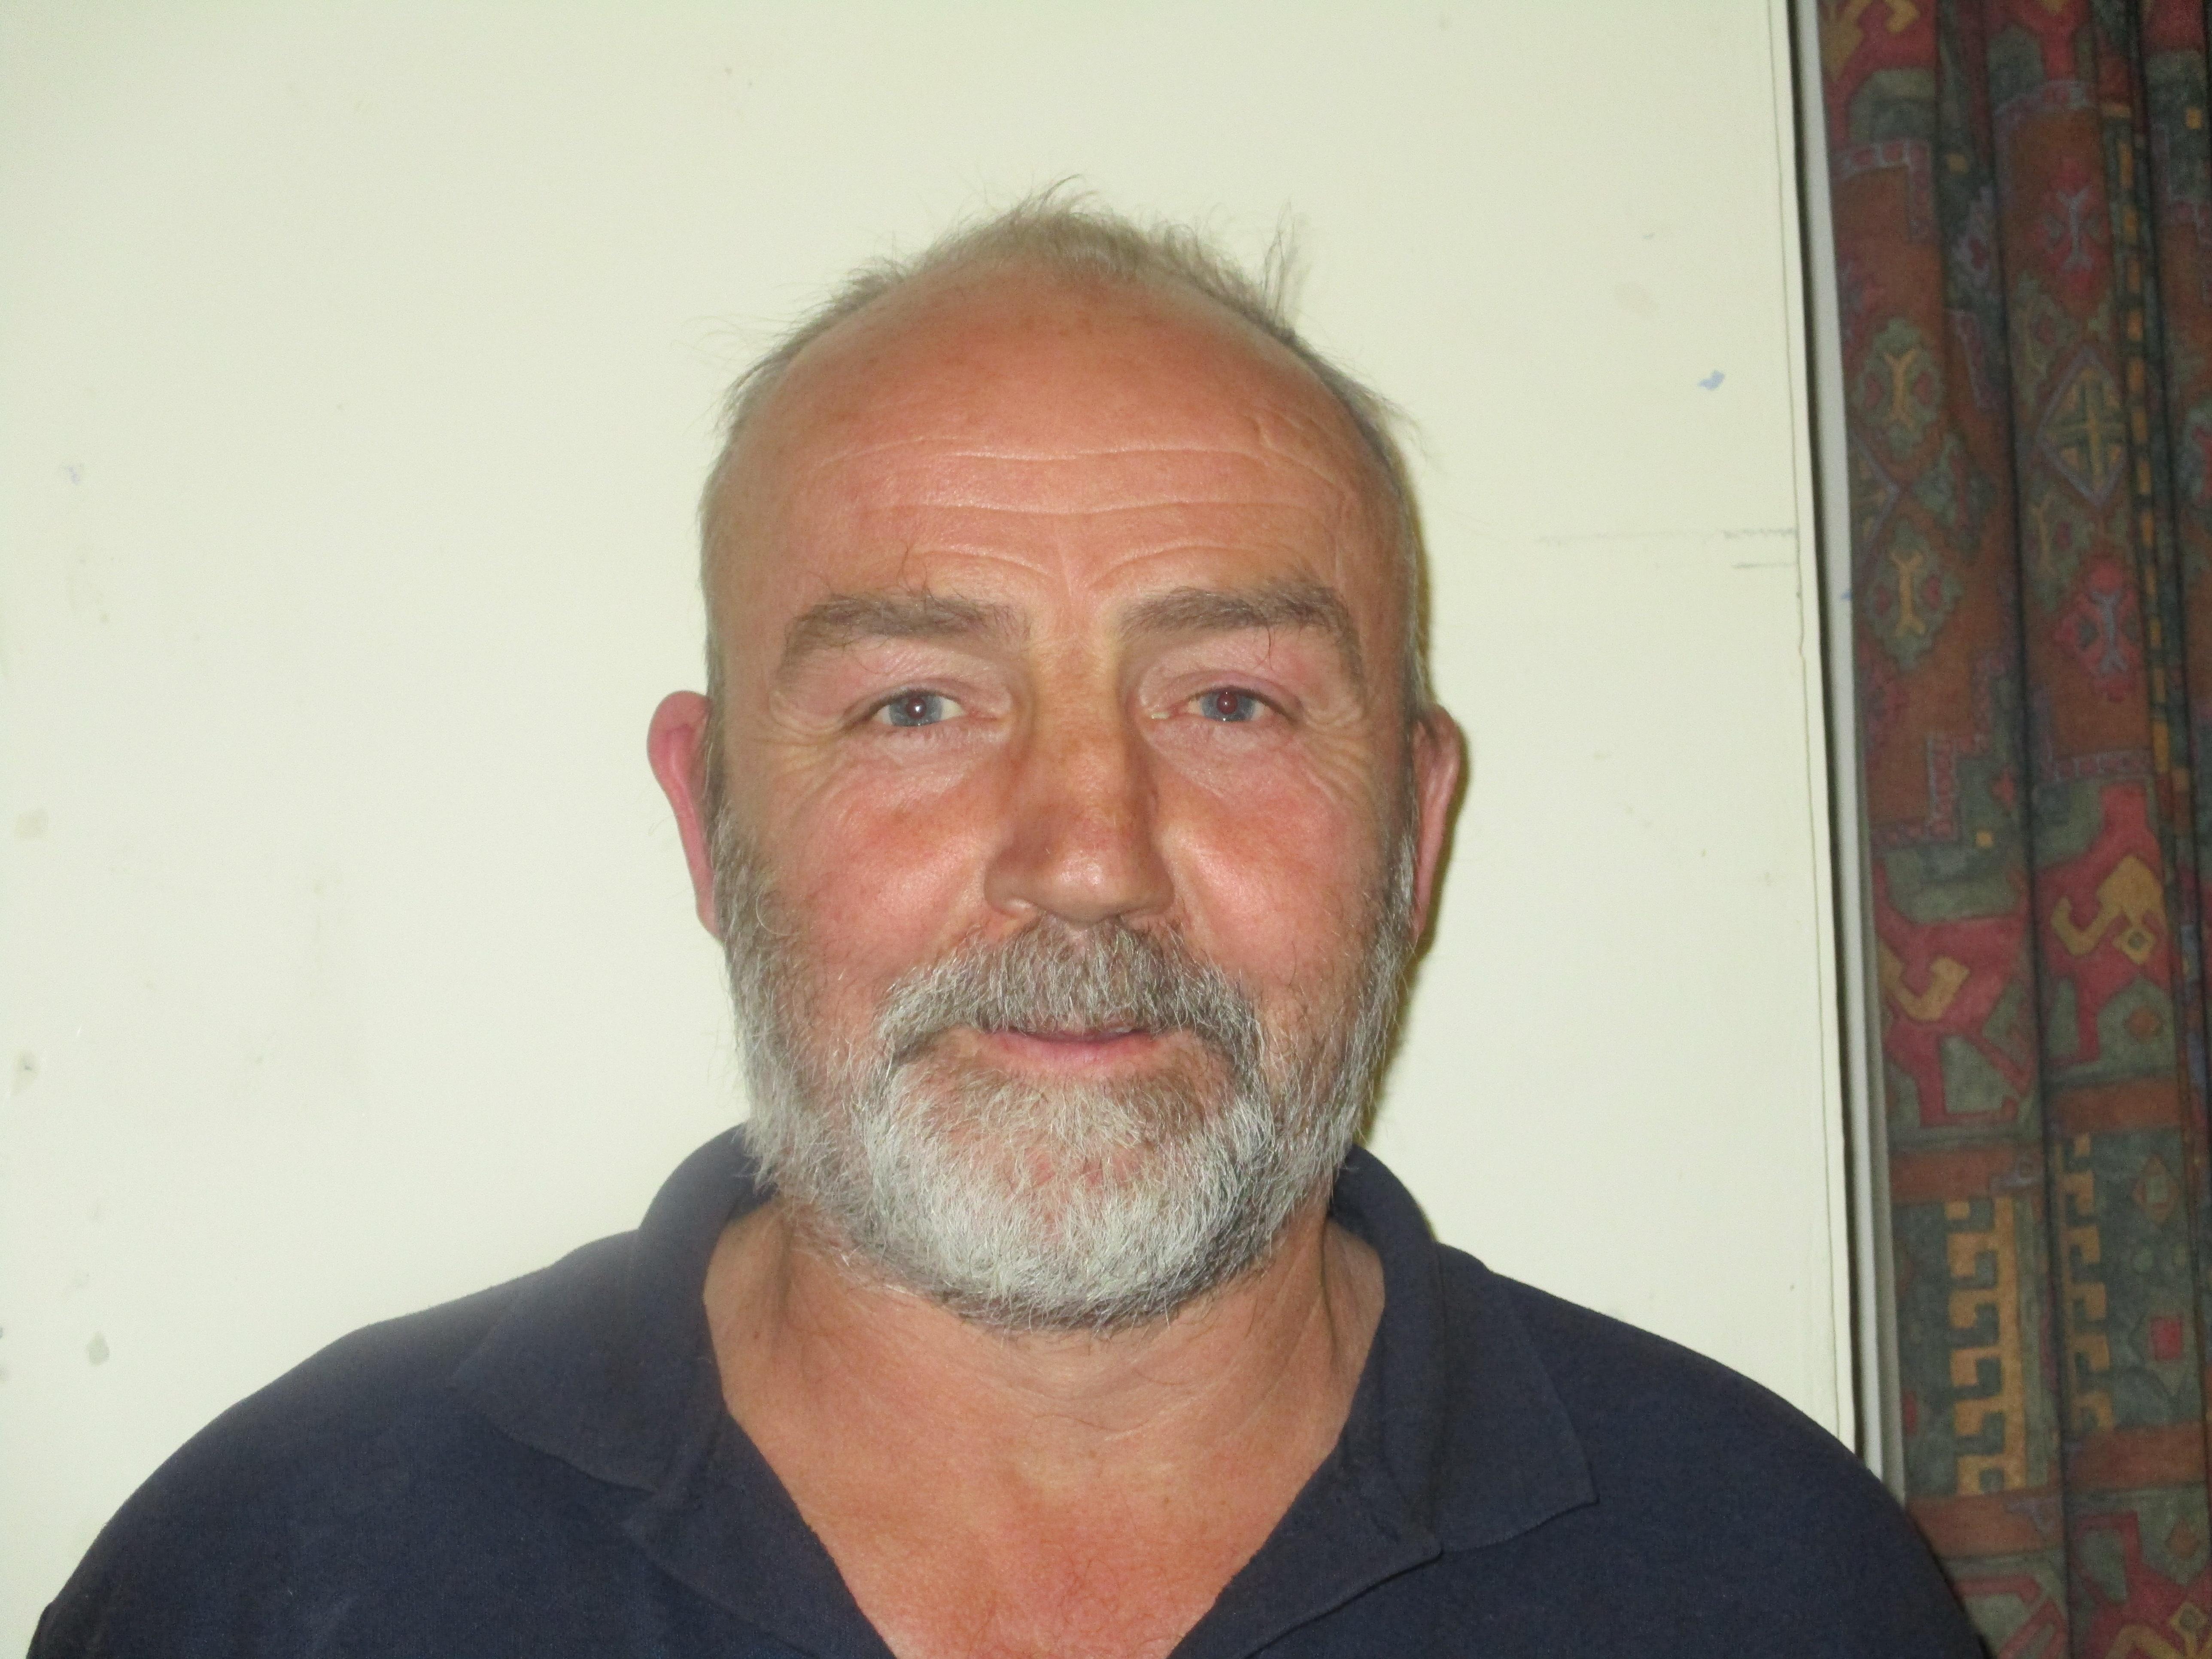 Keith Powell